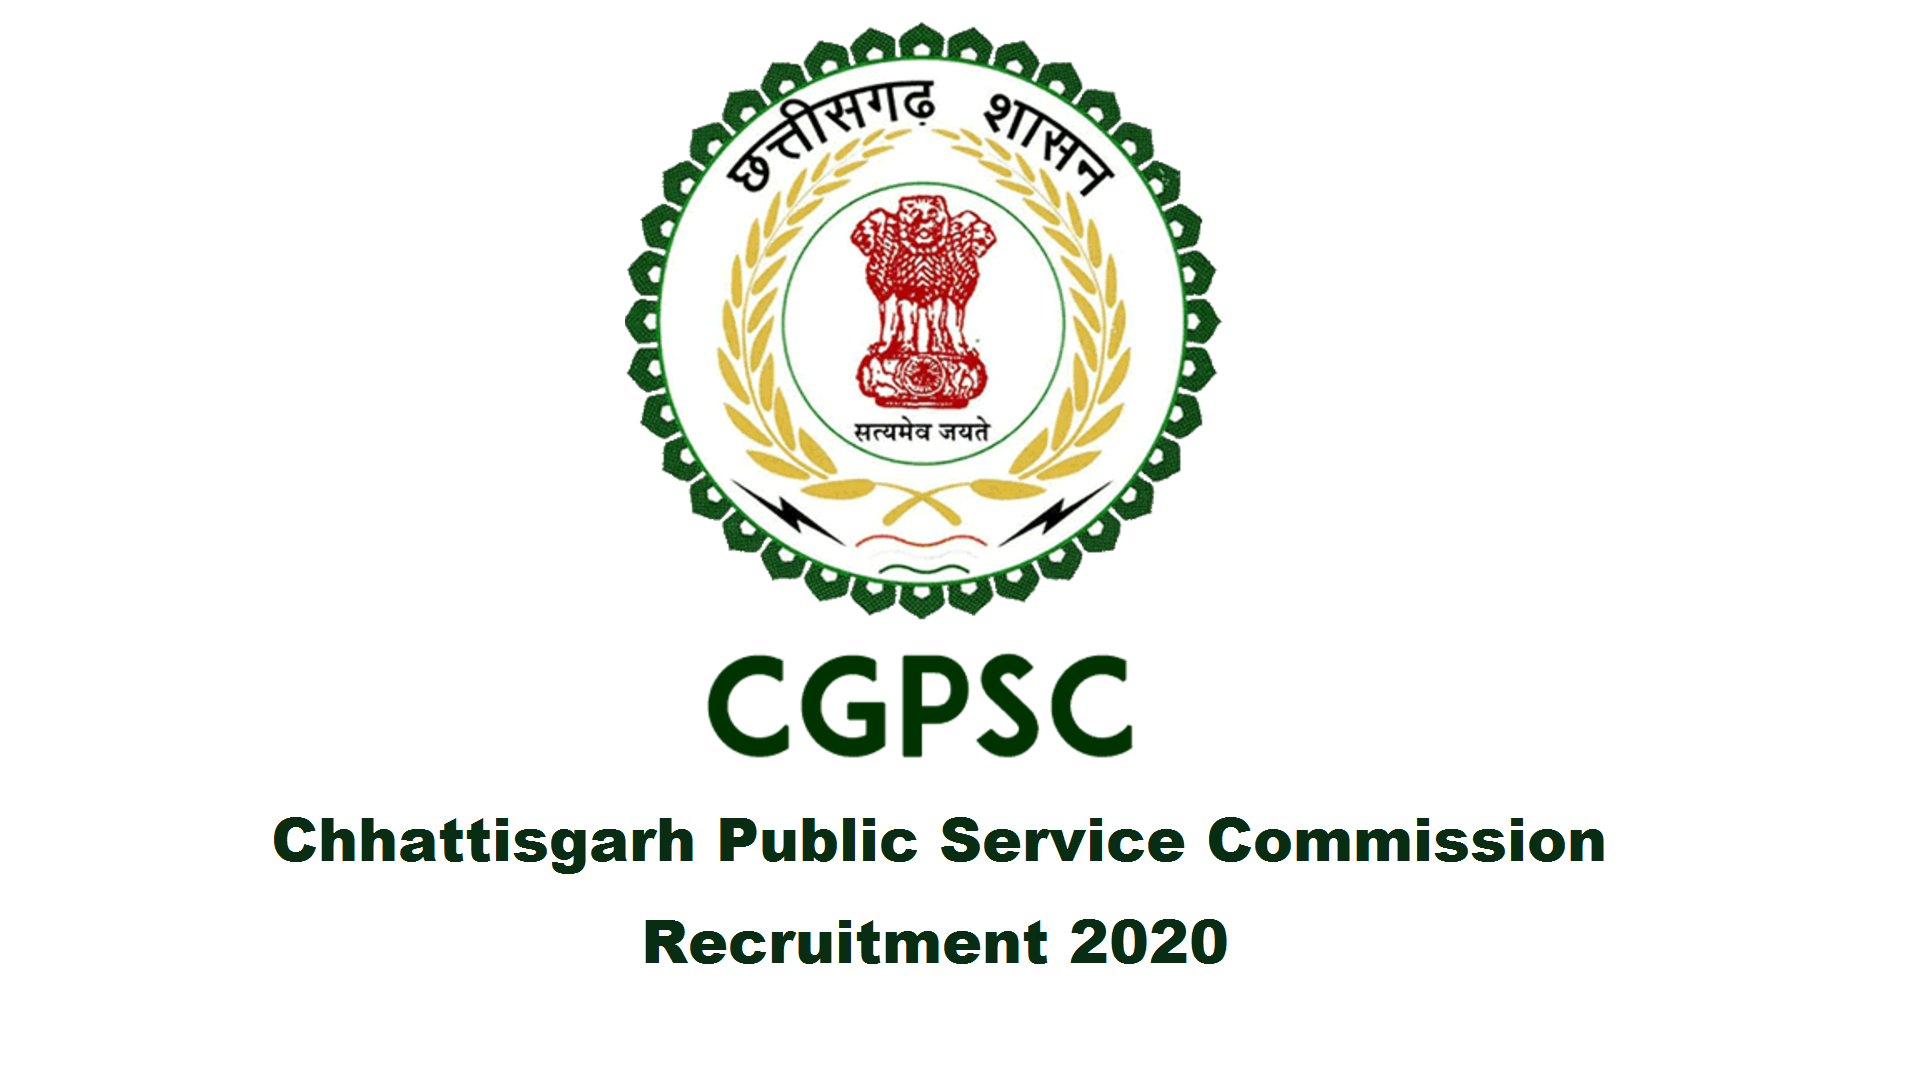 Chhattisgarh Public Service Commission (CGPSC) recruitment 2020